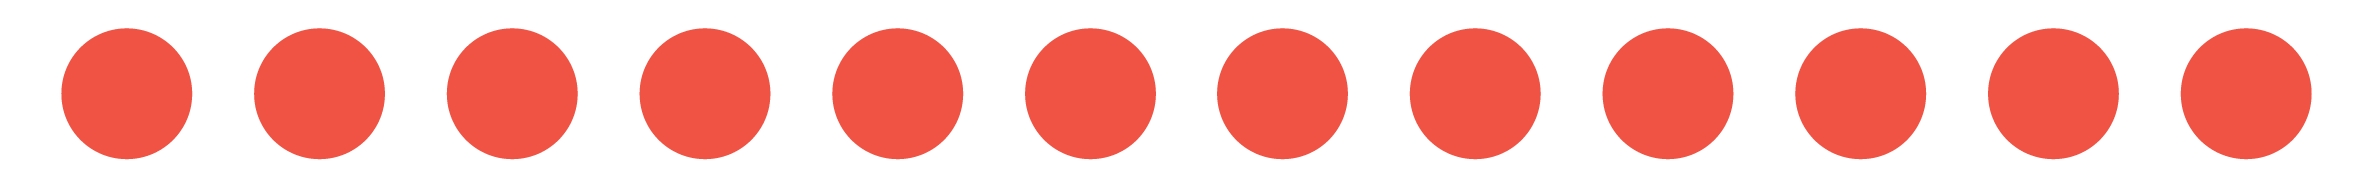 2021-22 CLC Dots_SM_Red